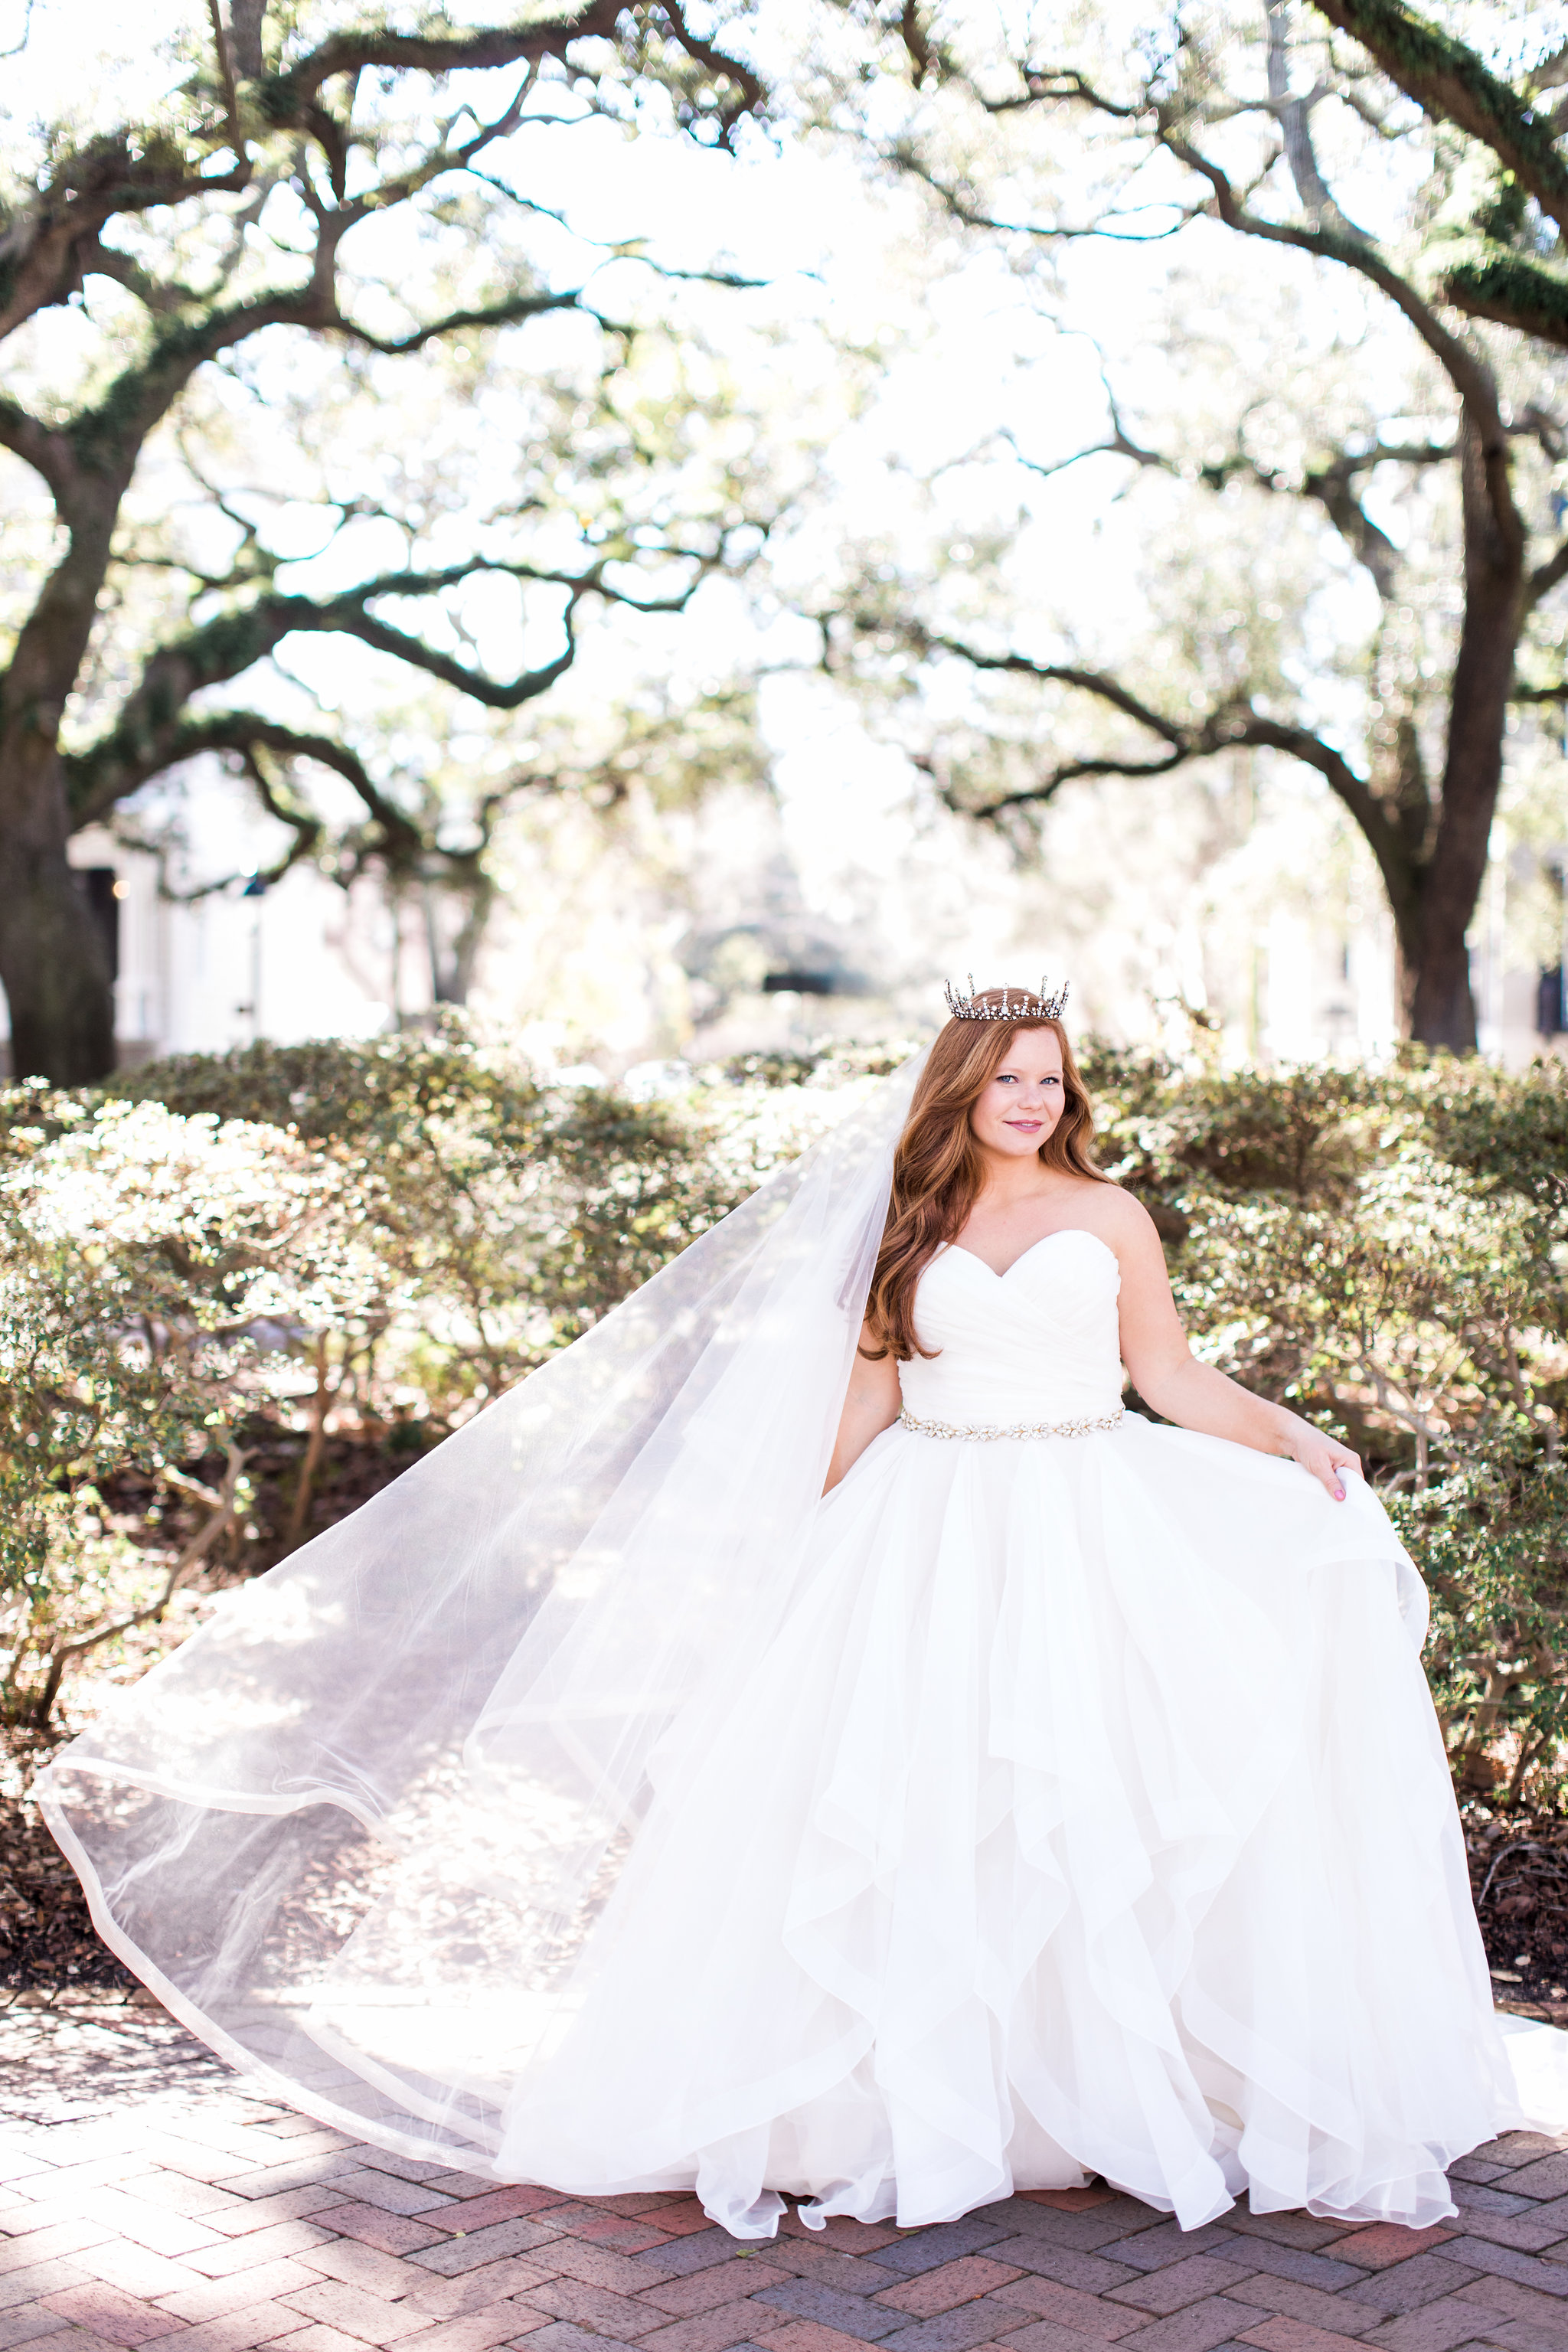 apt-b-photography-mary-elizabeths-bridal-boutique-adele-amelia-accessories-morilee-5504-savannah-bridal-boutique-savannah-weddings-savannah-wedding-photographer-savannah-bridal-gowns-savannah-wedding-dresses-historic-savannah-wedding-18.jpg